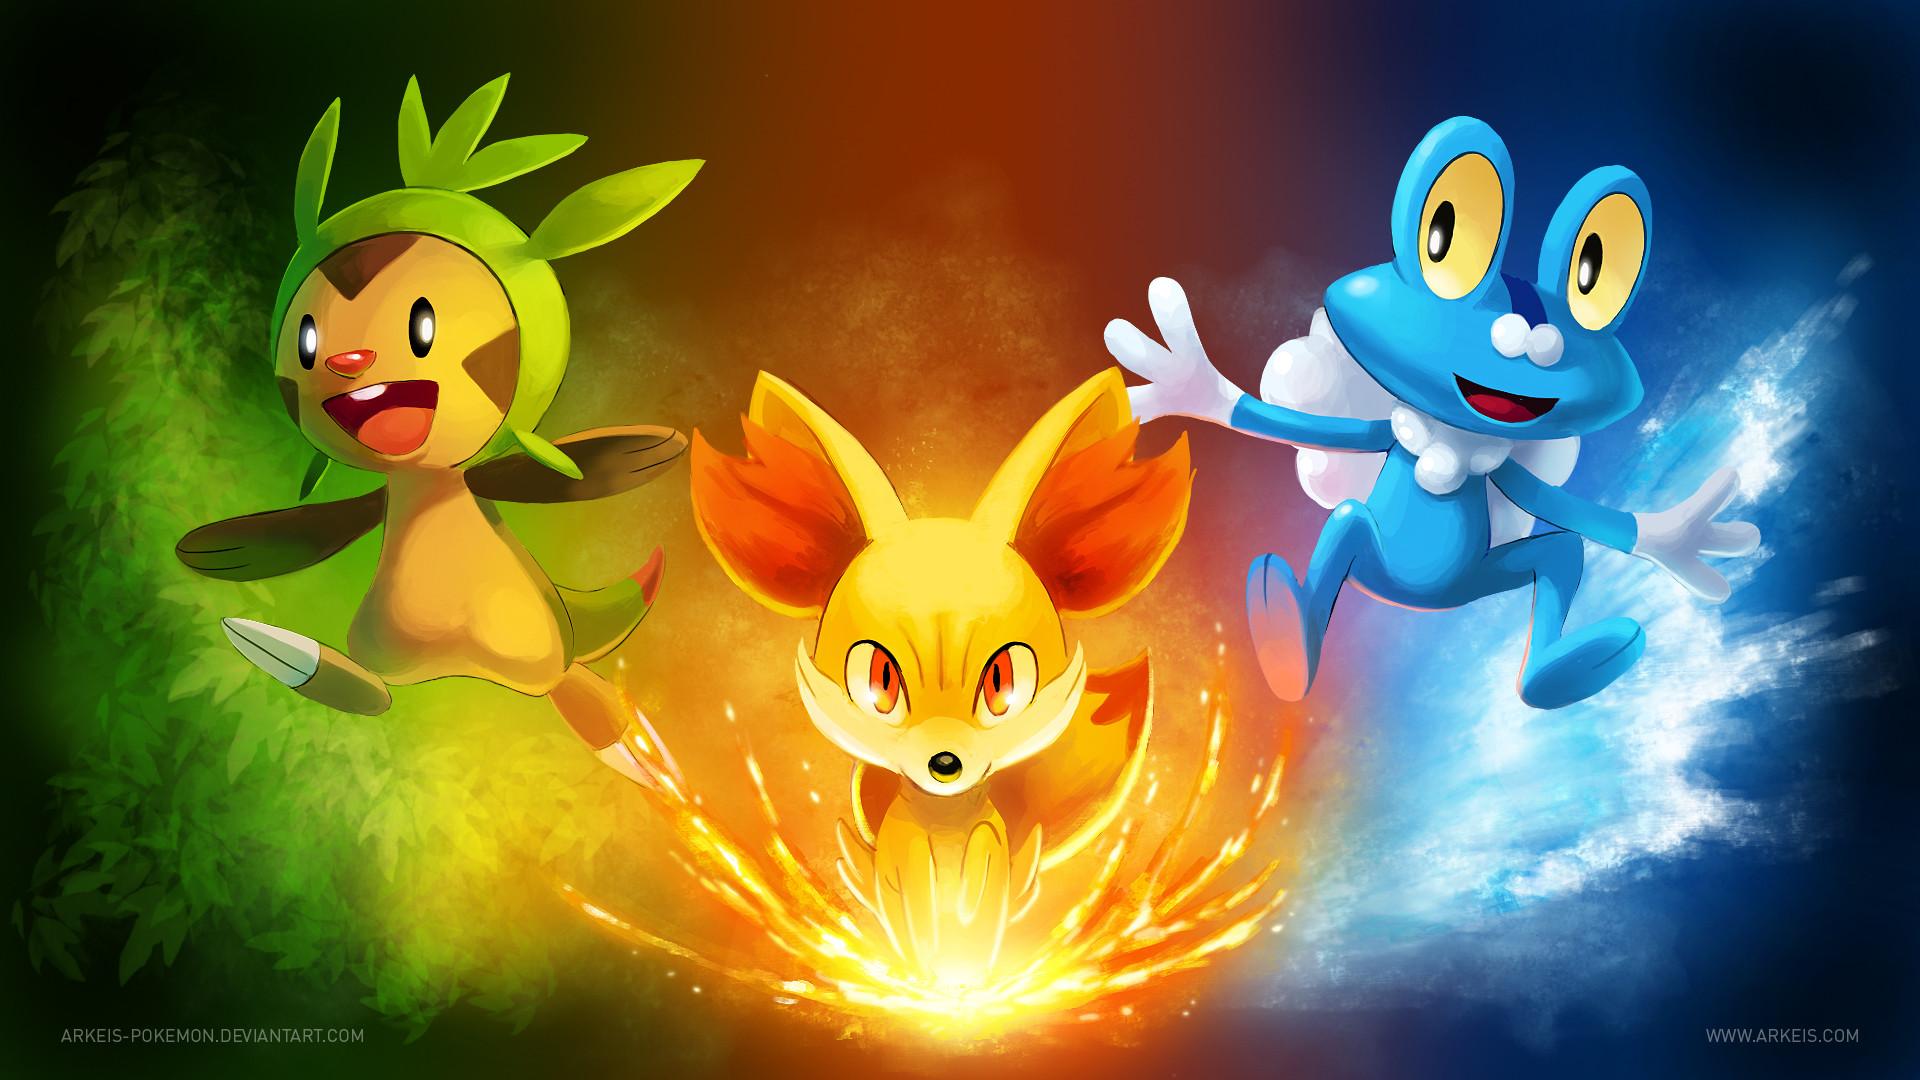 Download Pokemon Wallpaper Screensaver HD Full Size